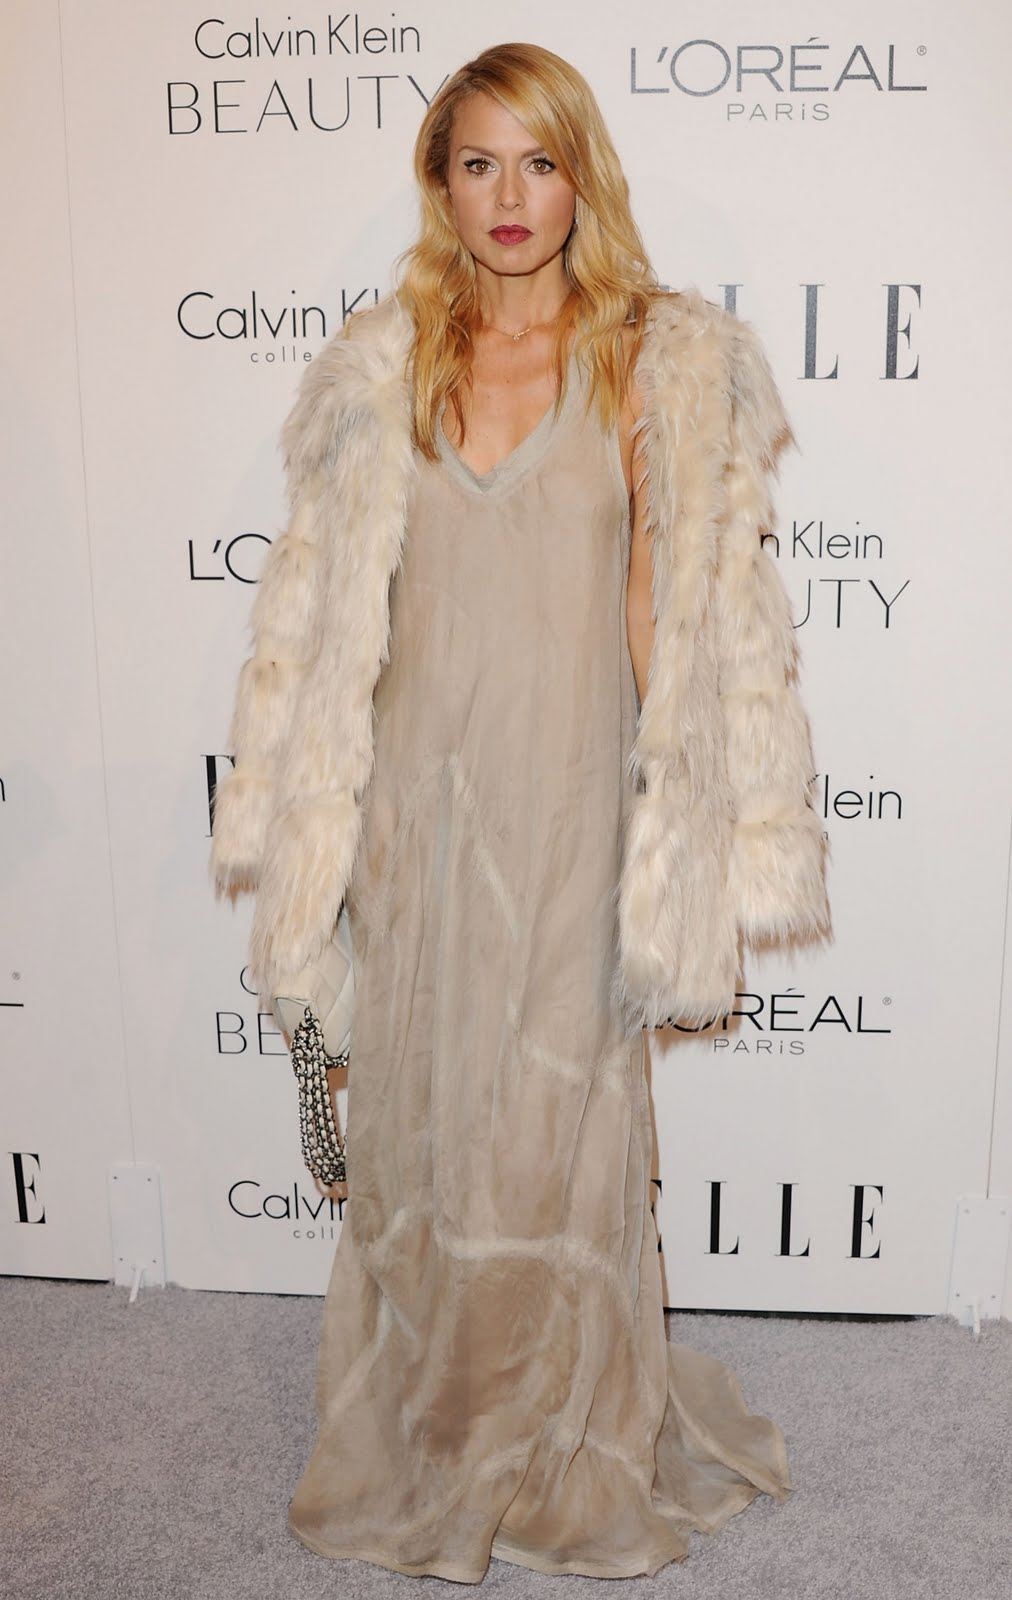 daf38ec742 Marc Kaufman Furs NY Designer Fur Fashion. Fur Coats Fur Jackets ...